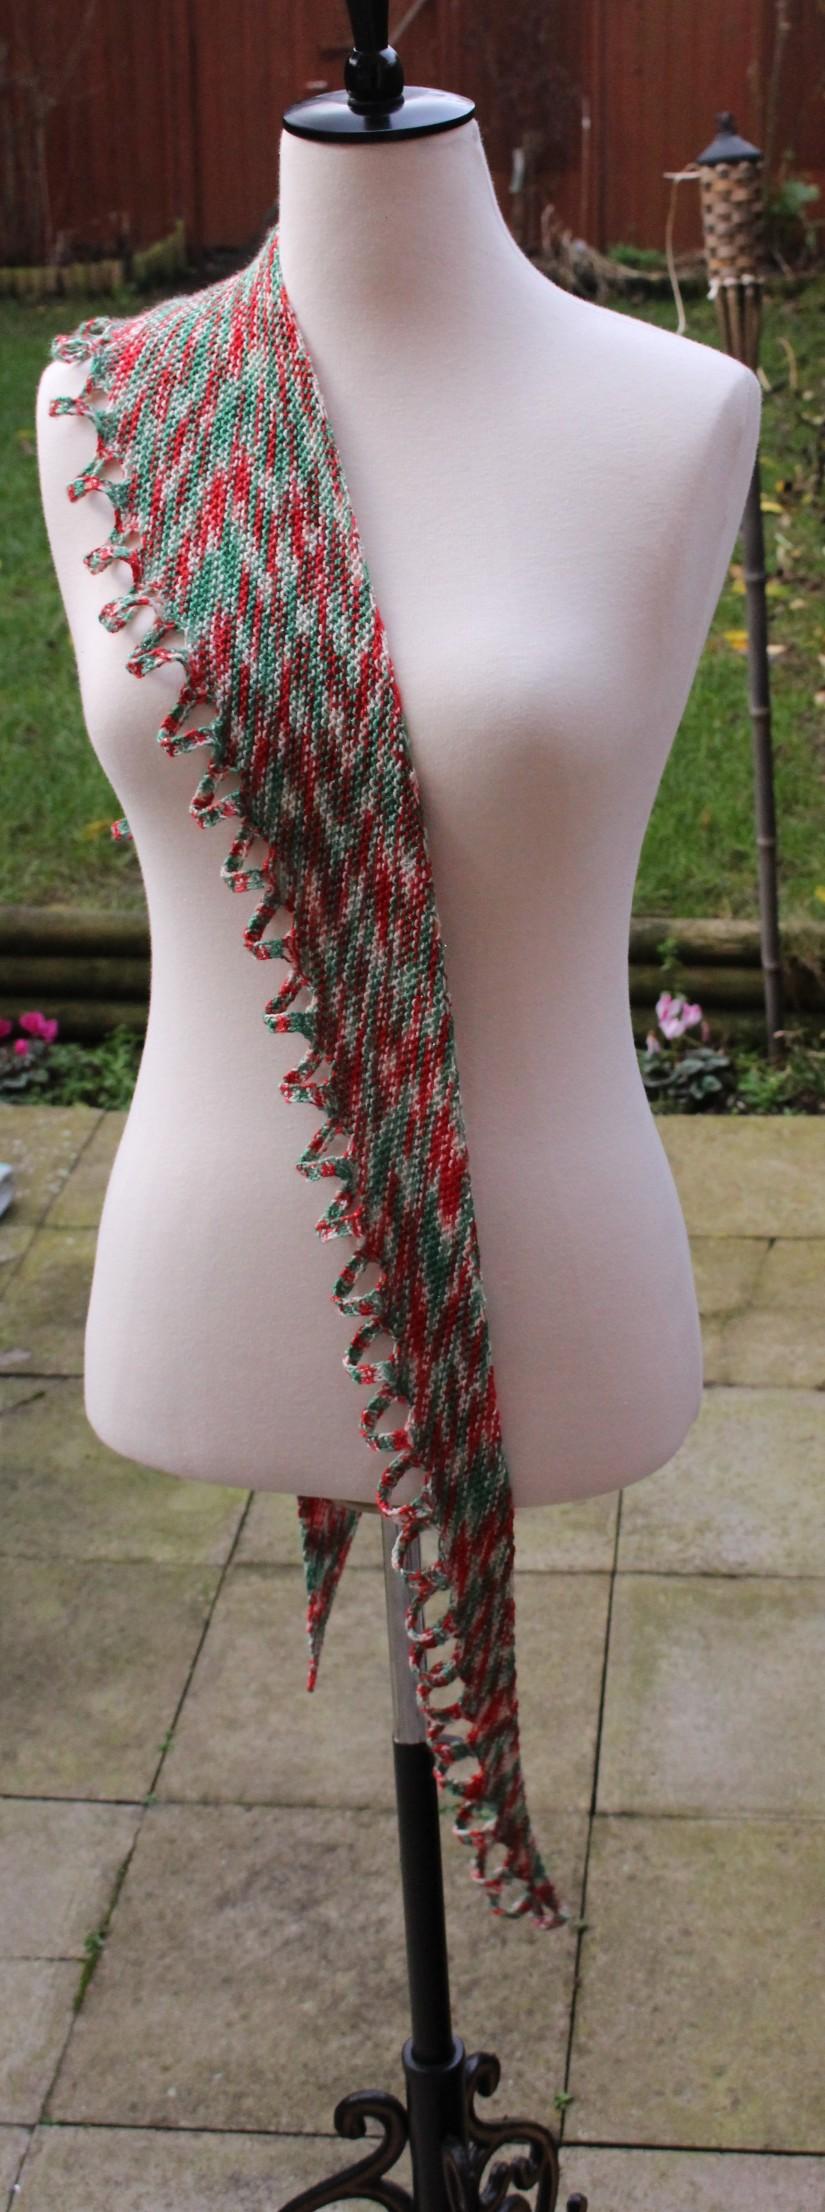 Miss Winkle scarf